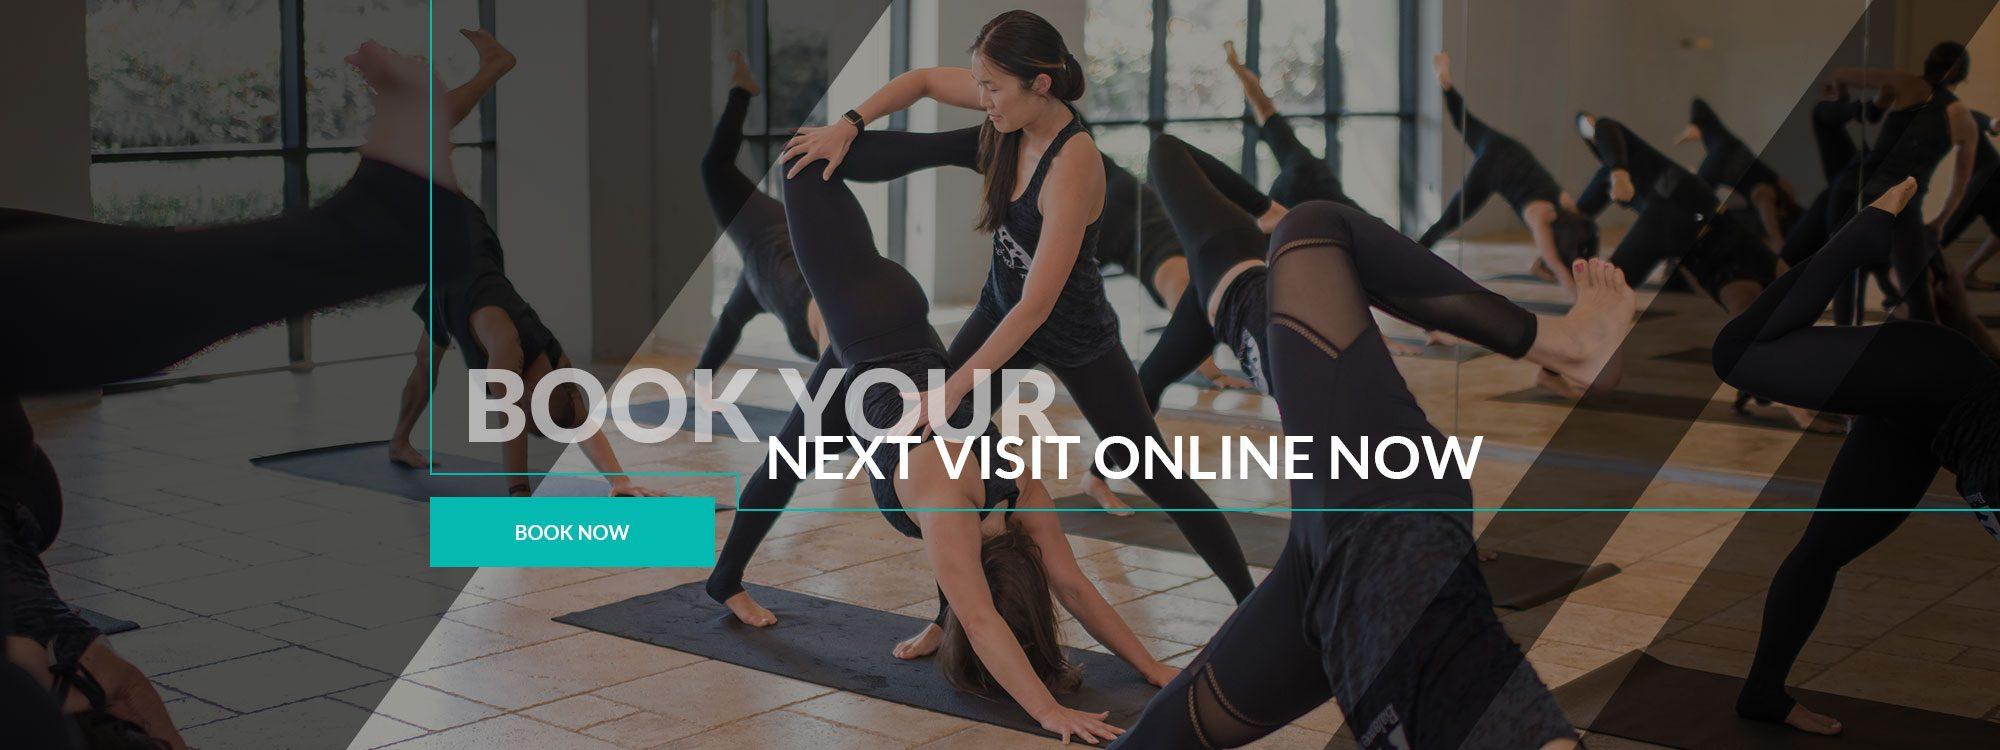 Welcome To Balance Yoga Center San Jose S Premier Yoga Studio